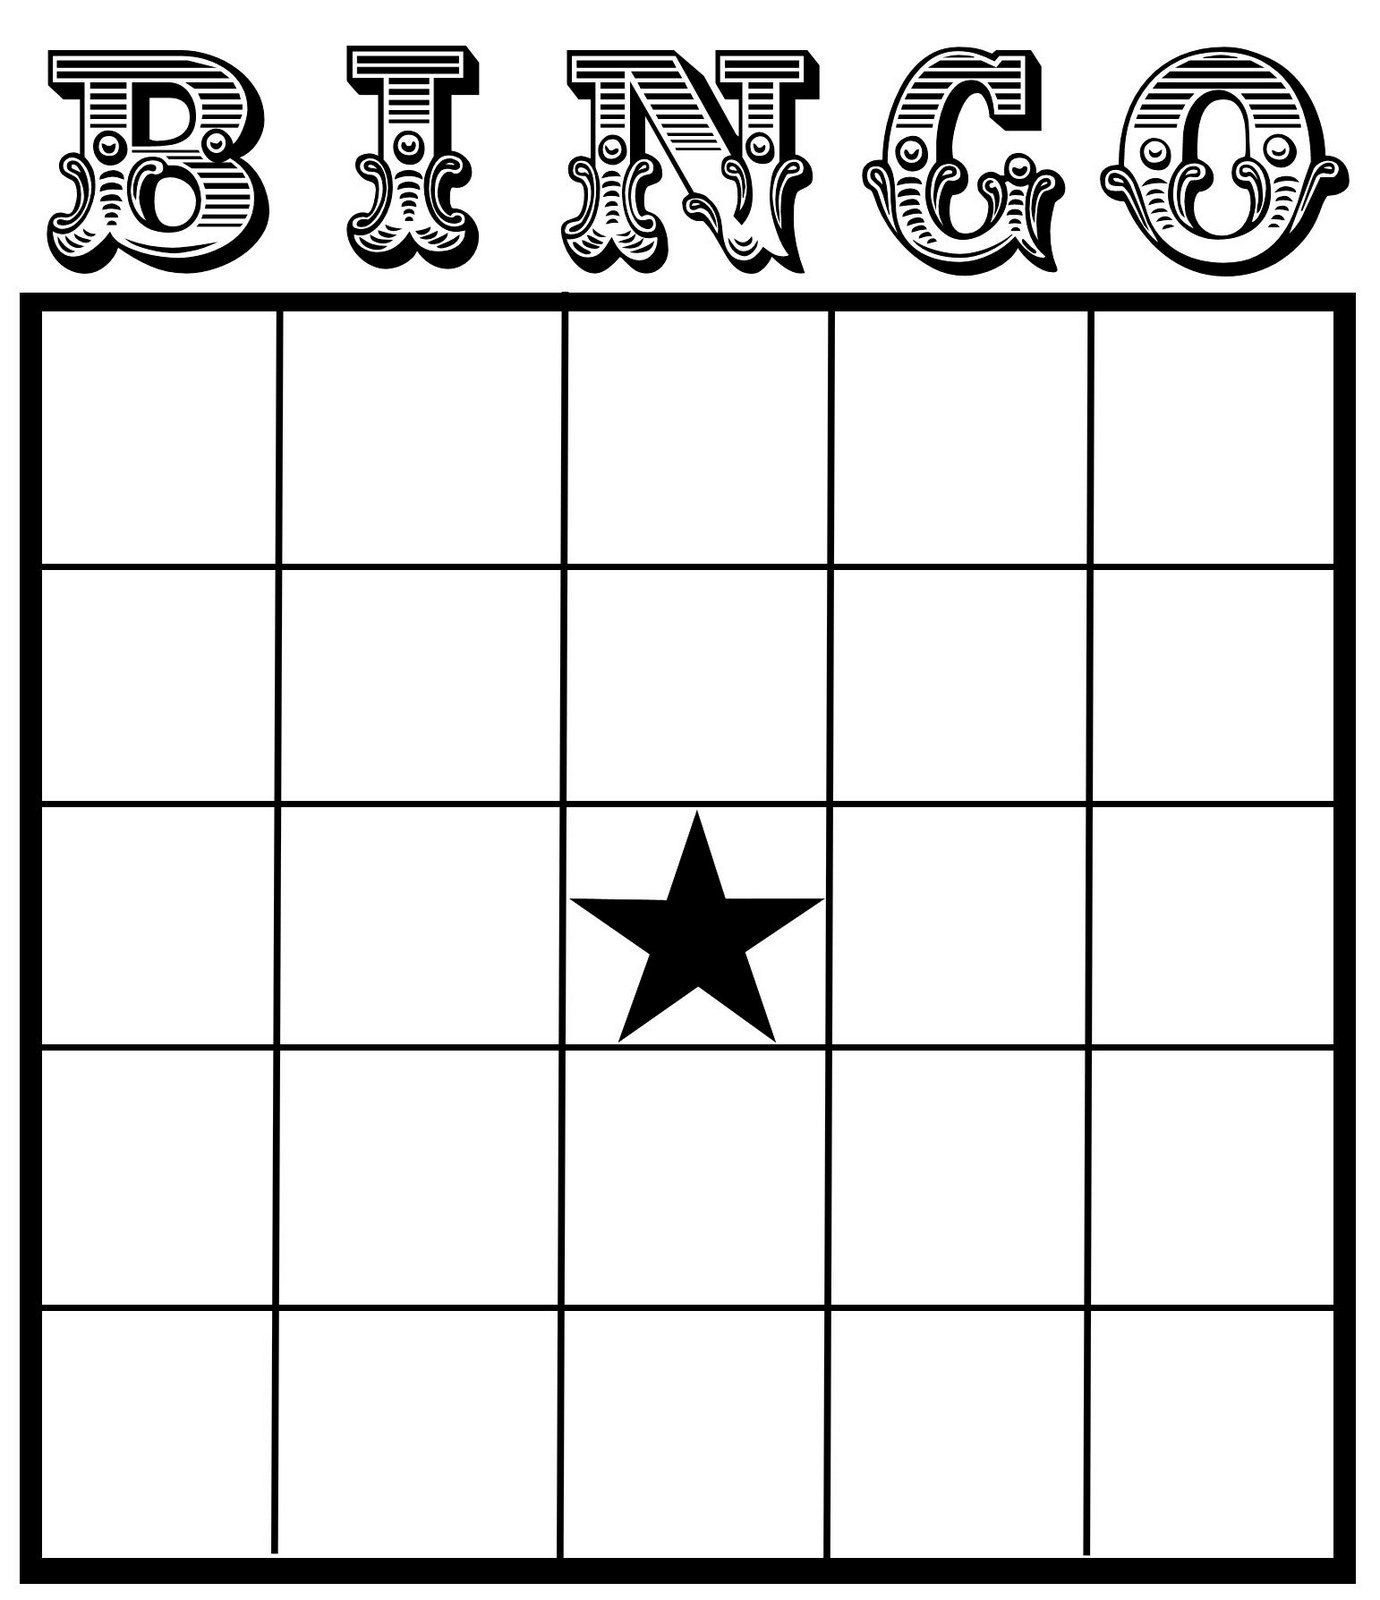 Bingo Card - Bing Images | Bingo Card Template, Bingo